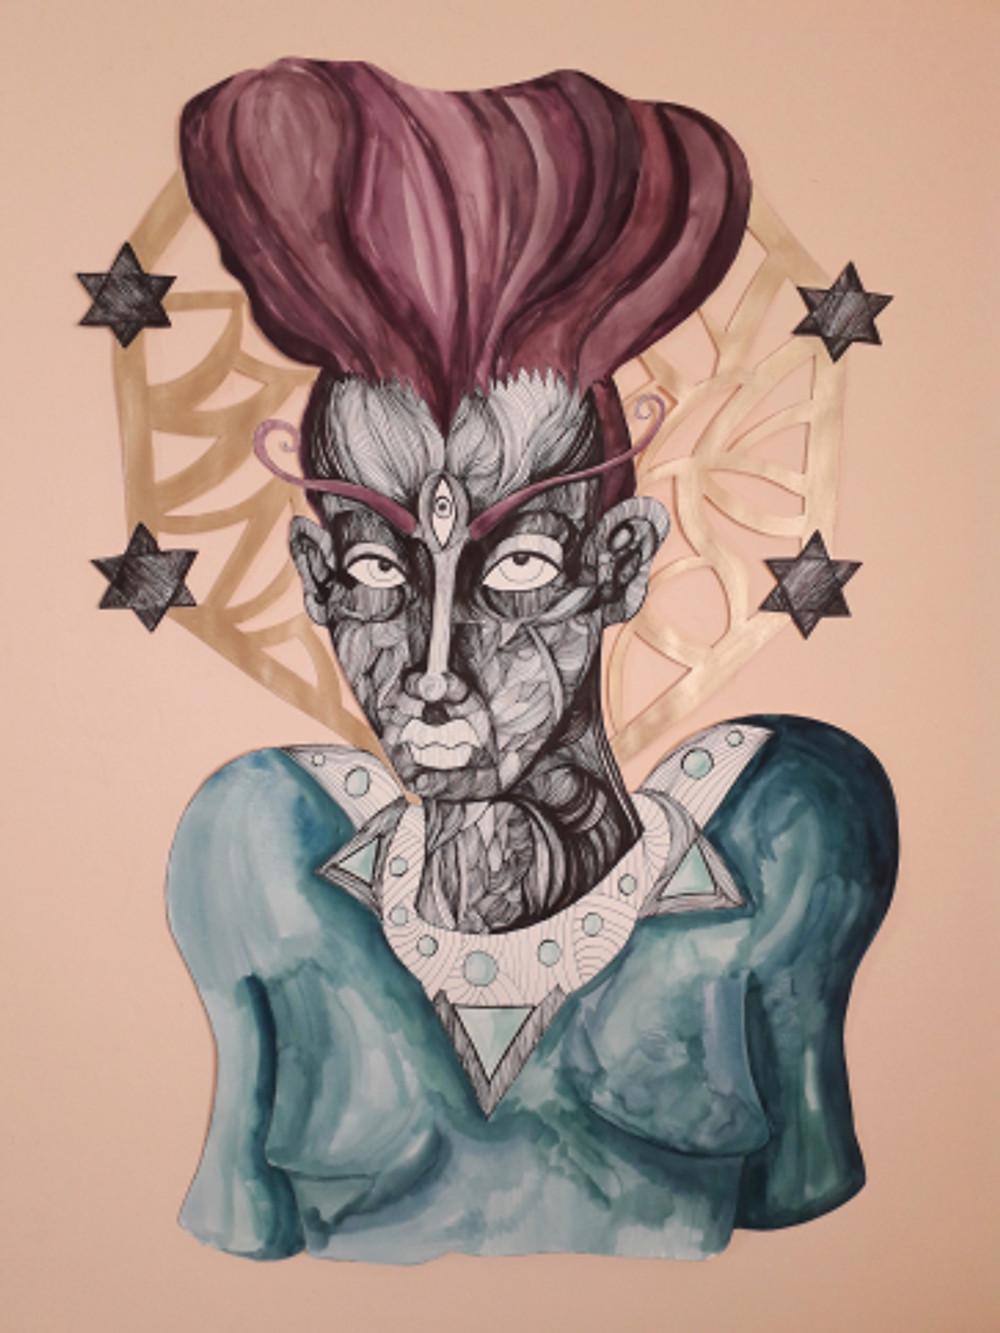 impossible expectations part ii, 97x66 cm, paper cut figure, inking pen, watercolor, 2018